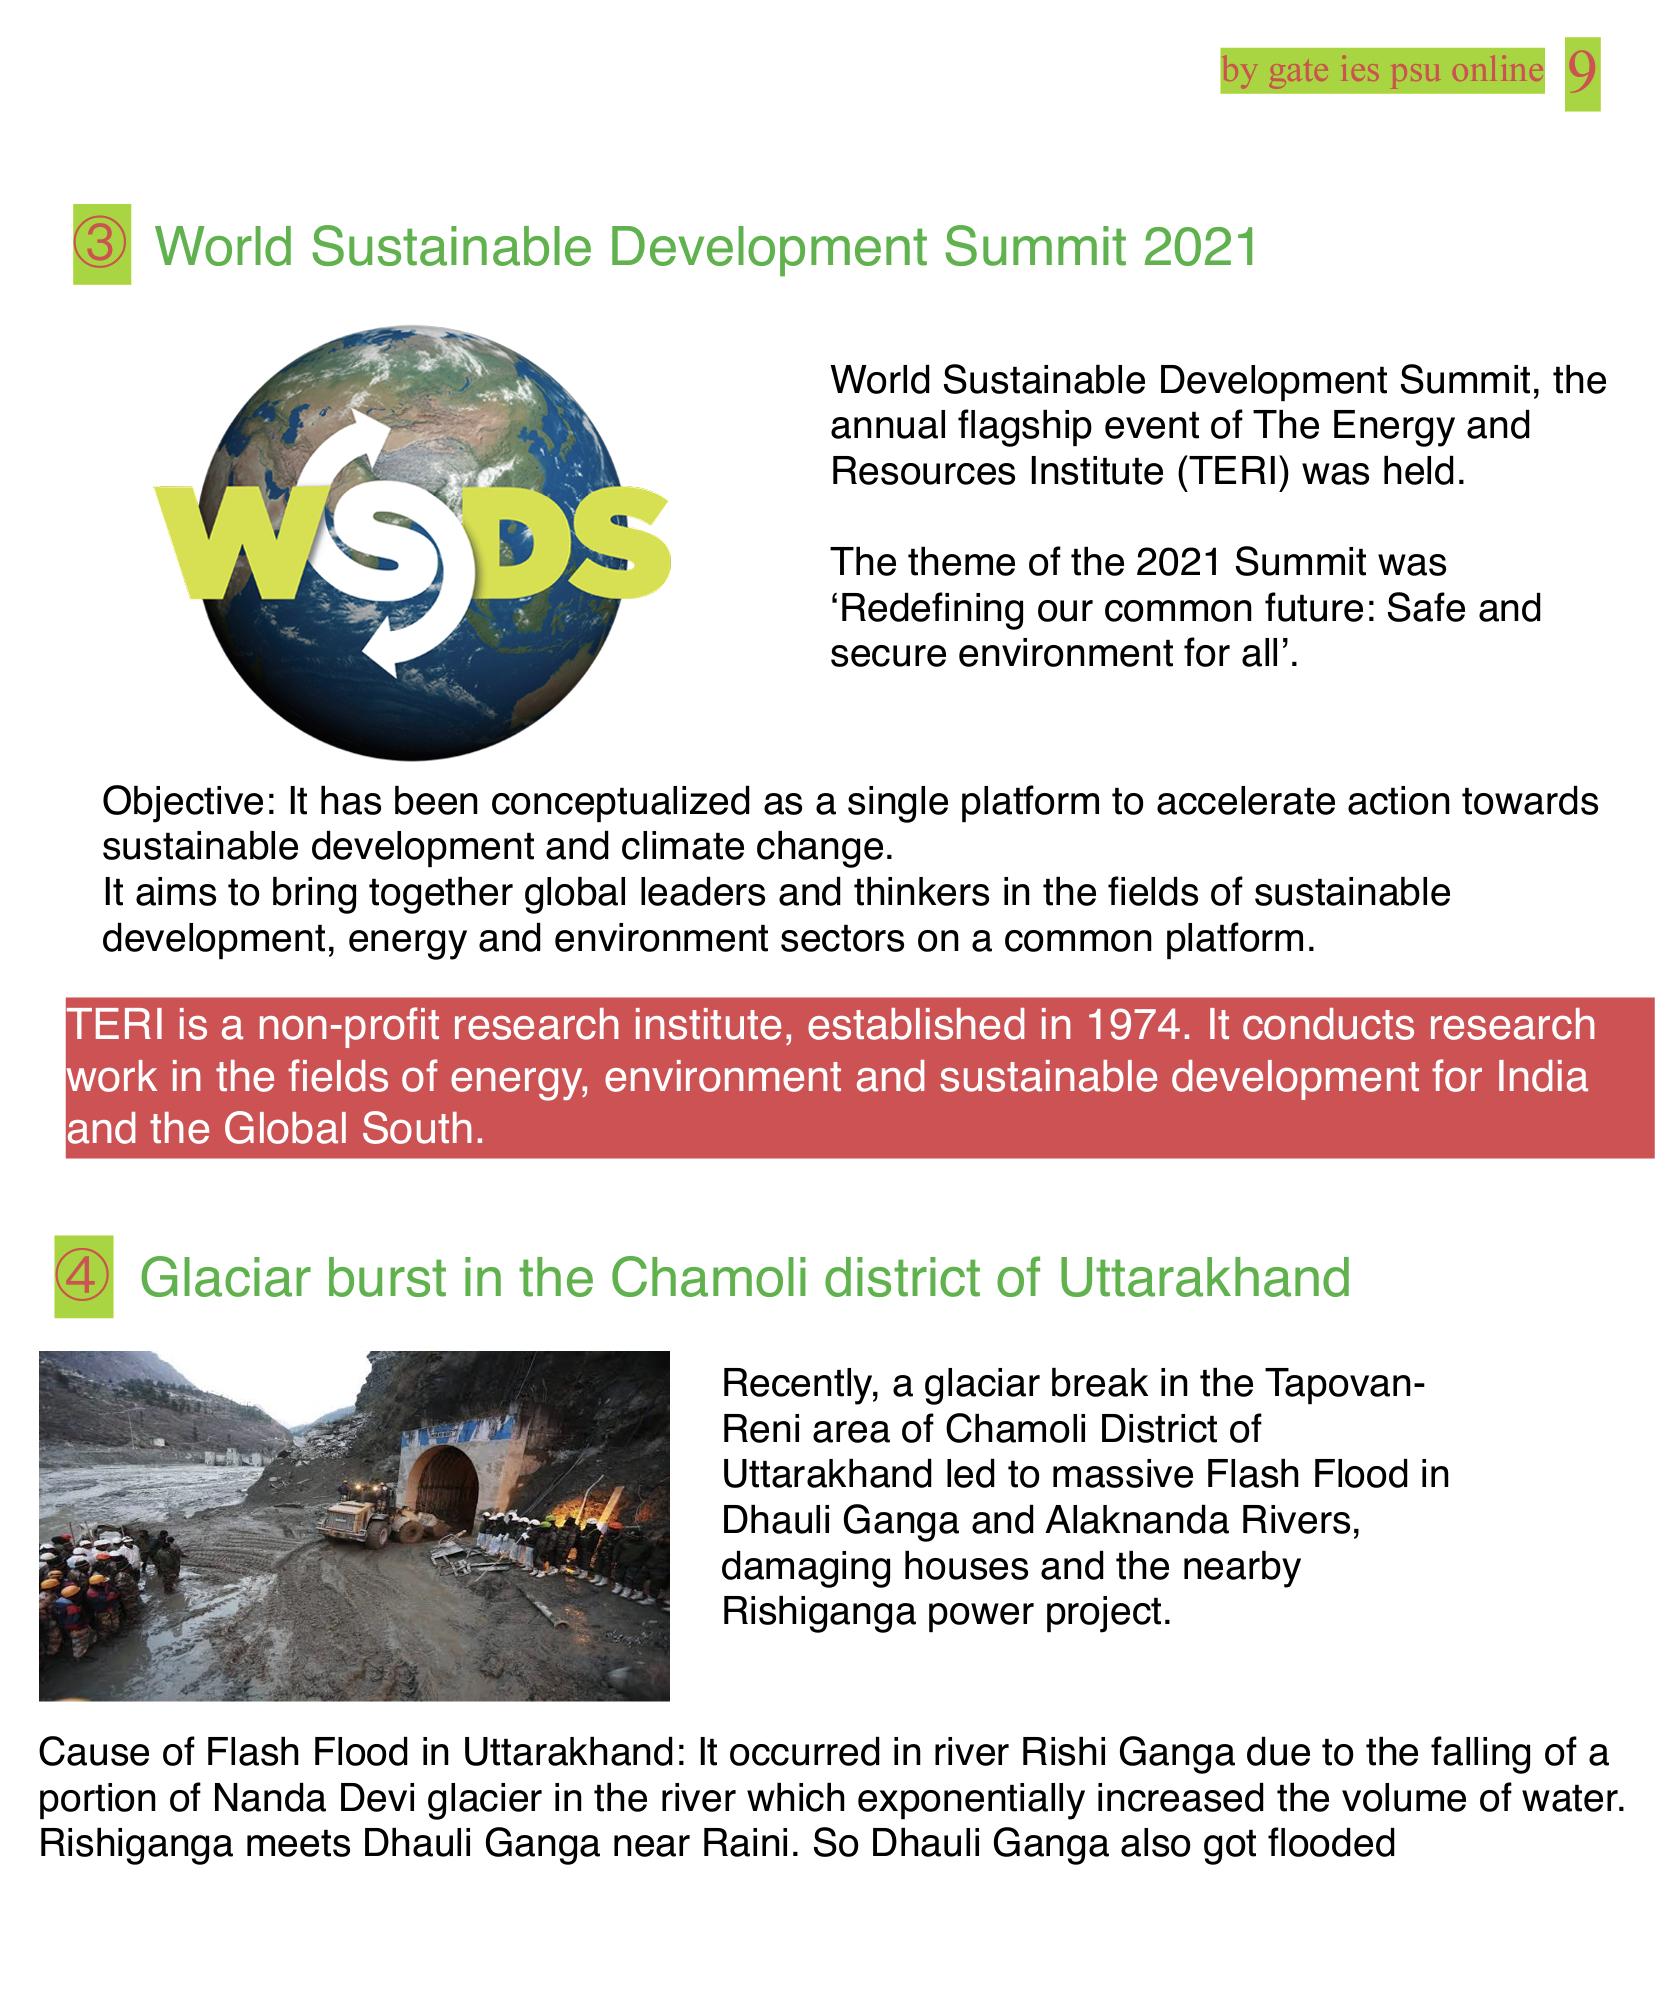 World sustainable submit 2021, TERI, CHAMOLI GLACIER BRUST, UPSC CURRENT AFFAIRS